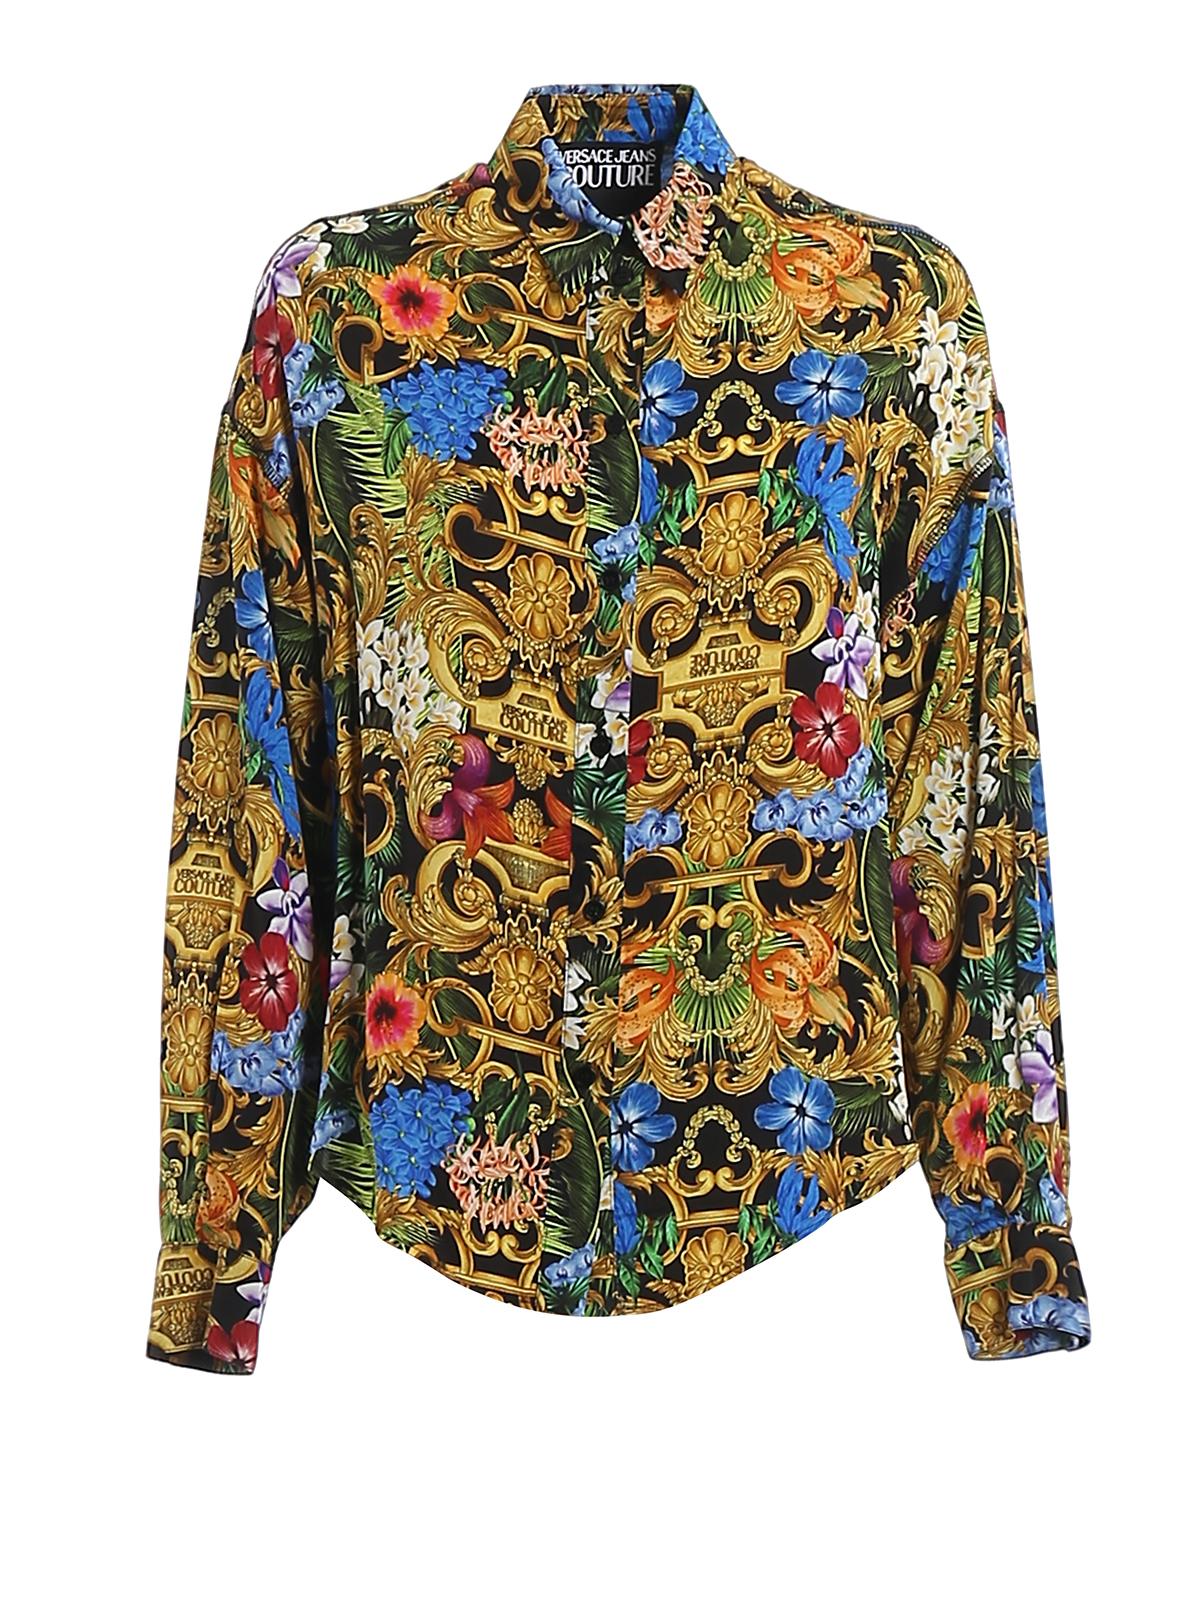 Versace Baroque Printed Shirt In Multicolour